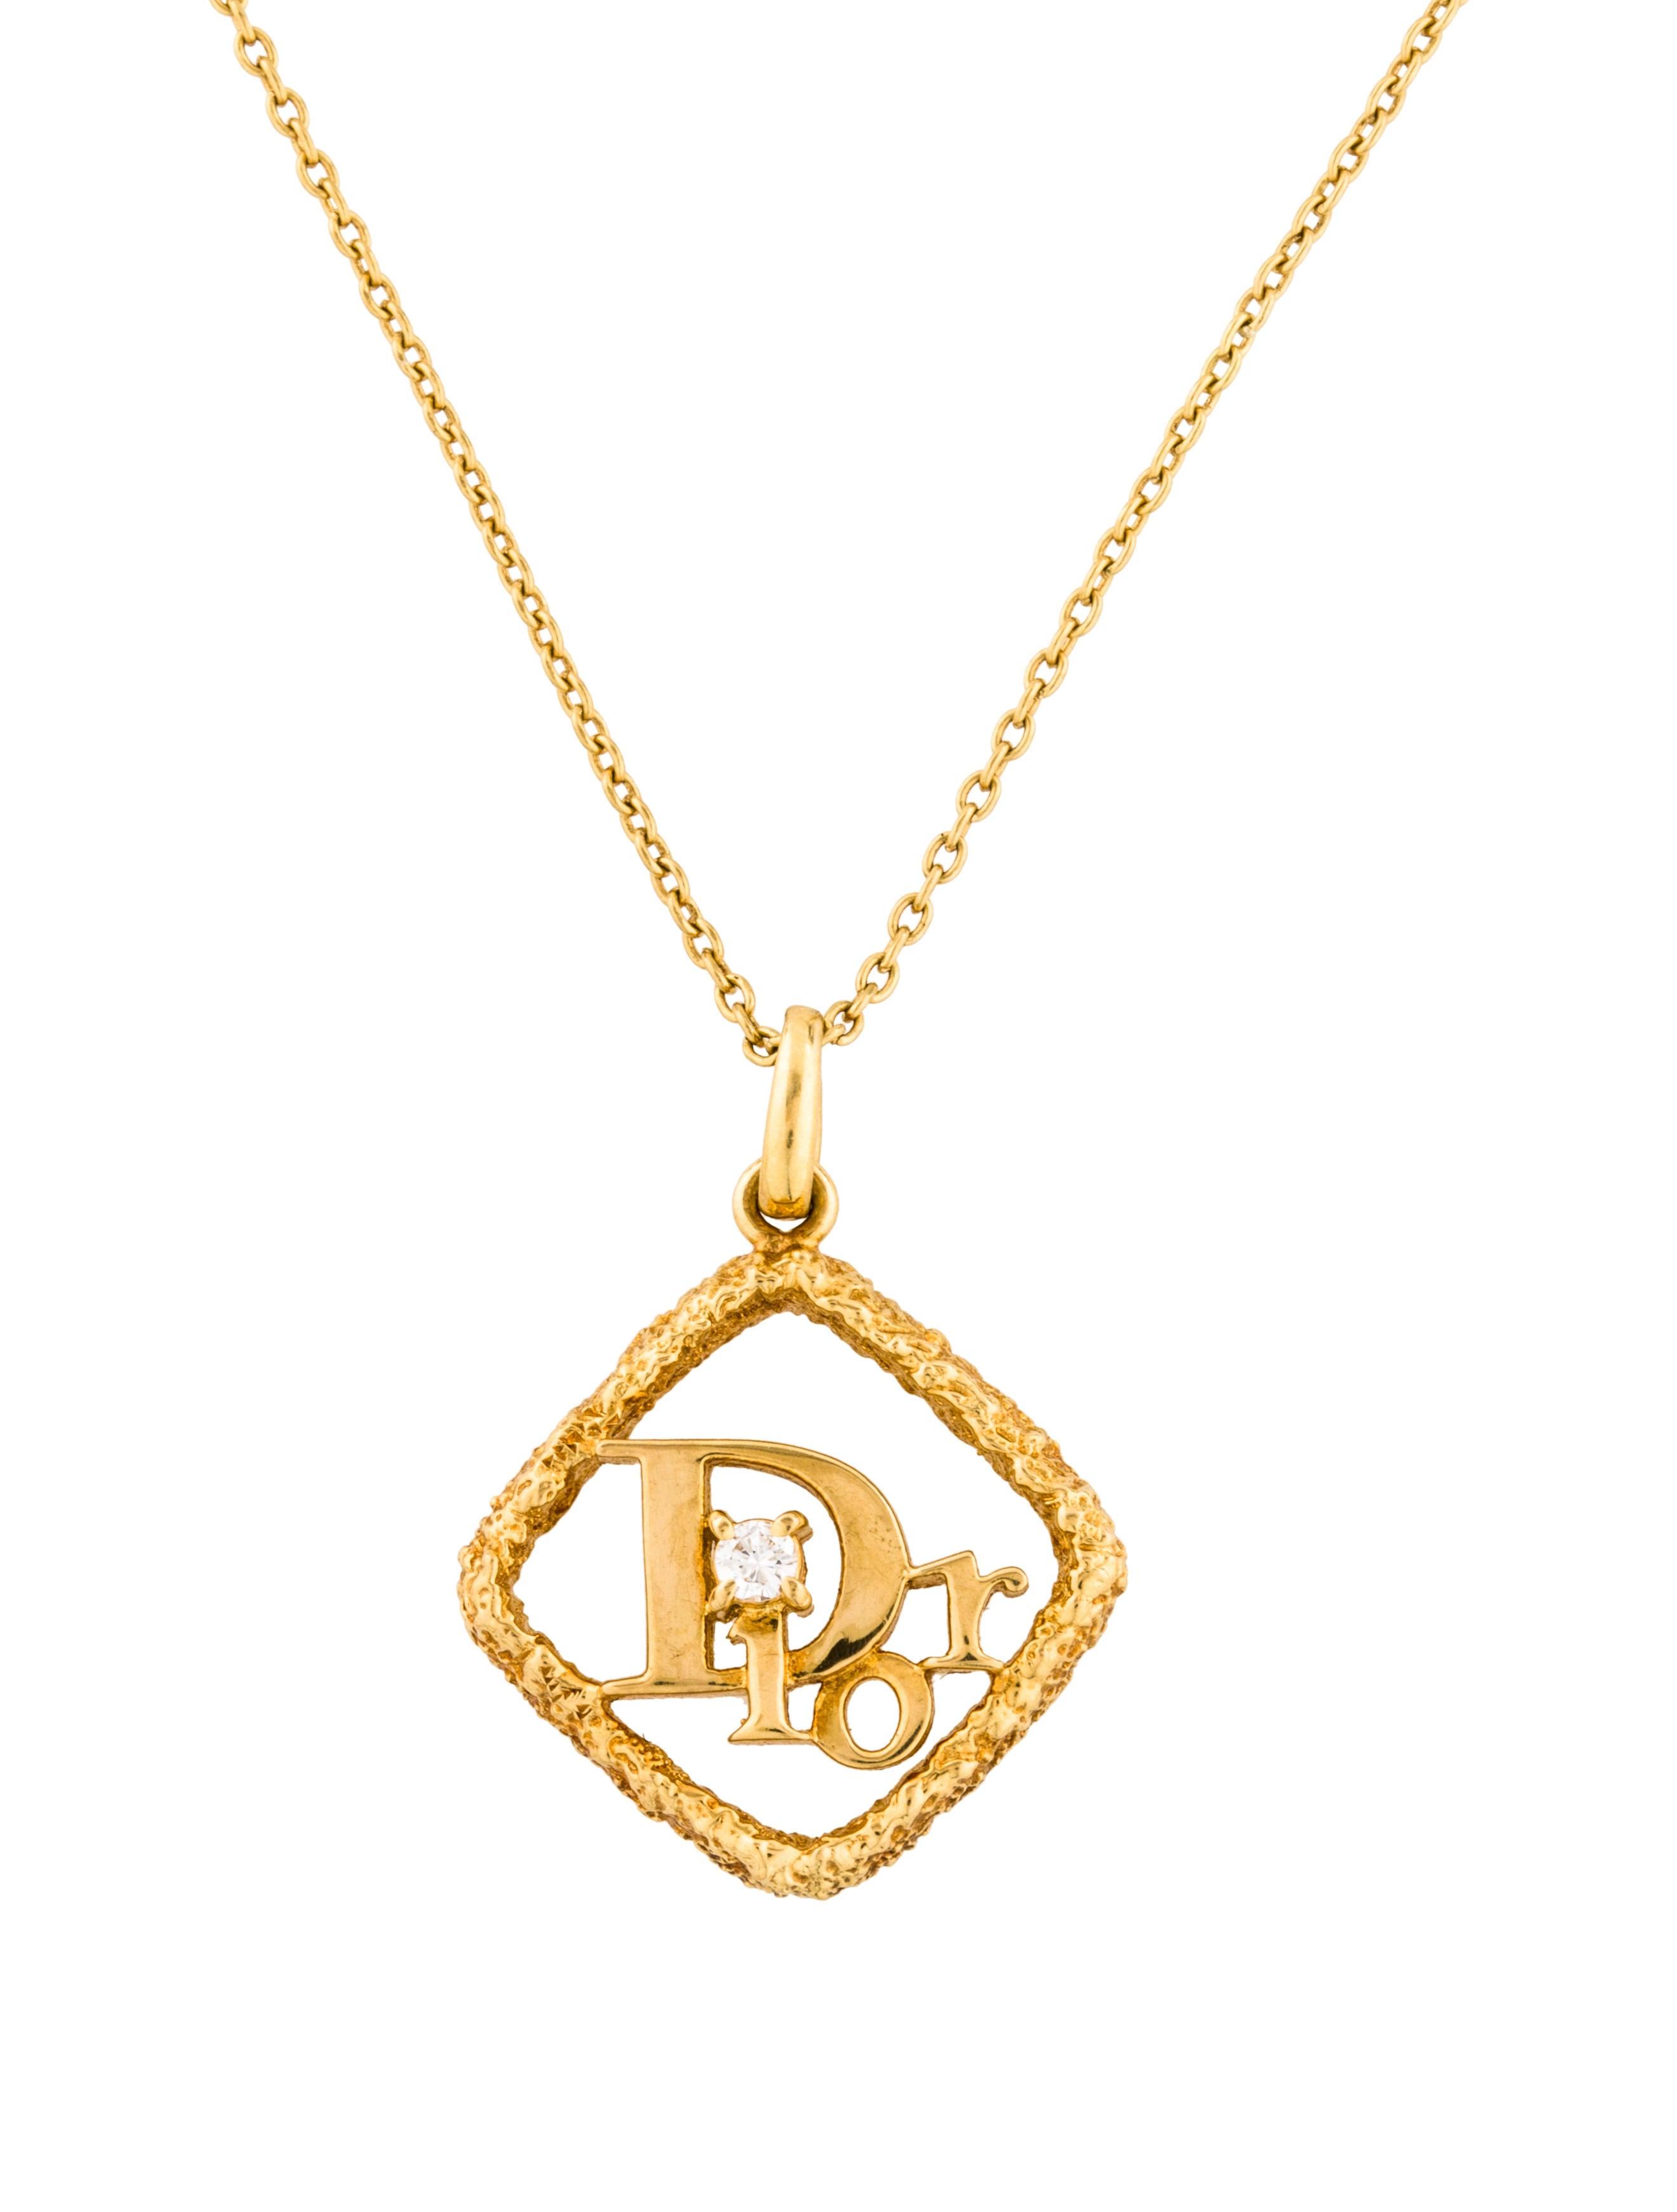 Christian dior 18k diamond signature pendant necklace necklaces 18k diamond signature pendant necklace aloadofball Gallery